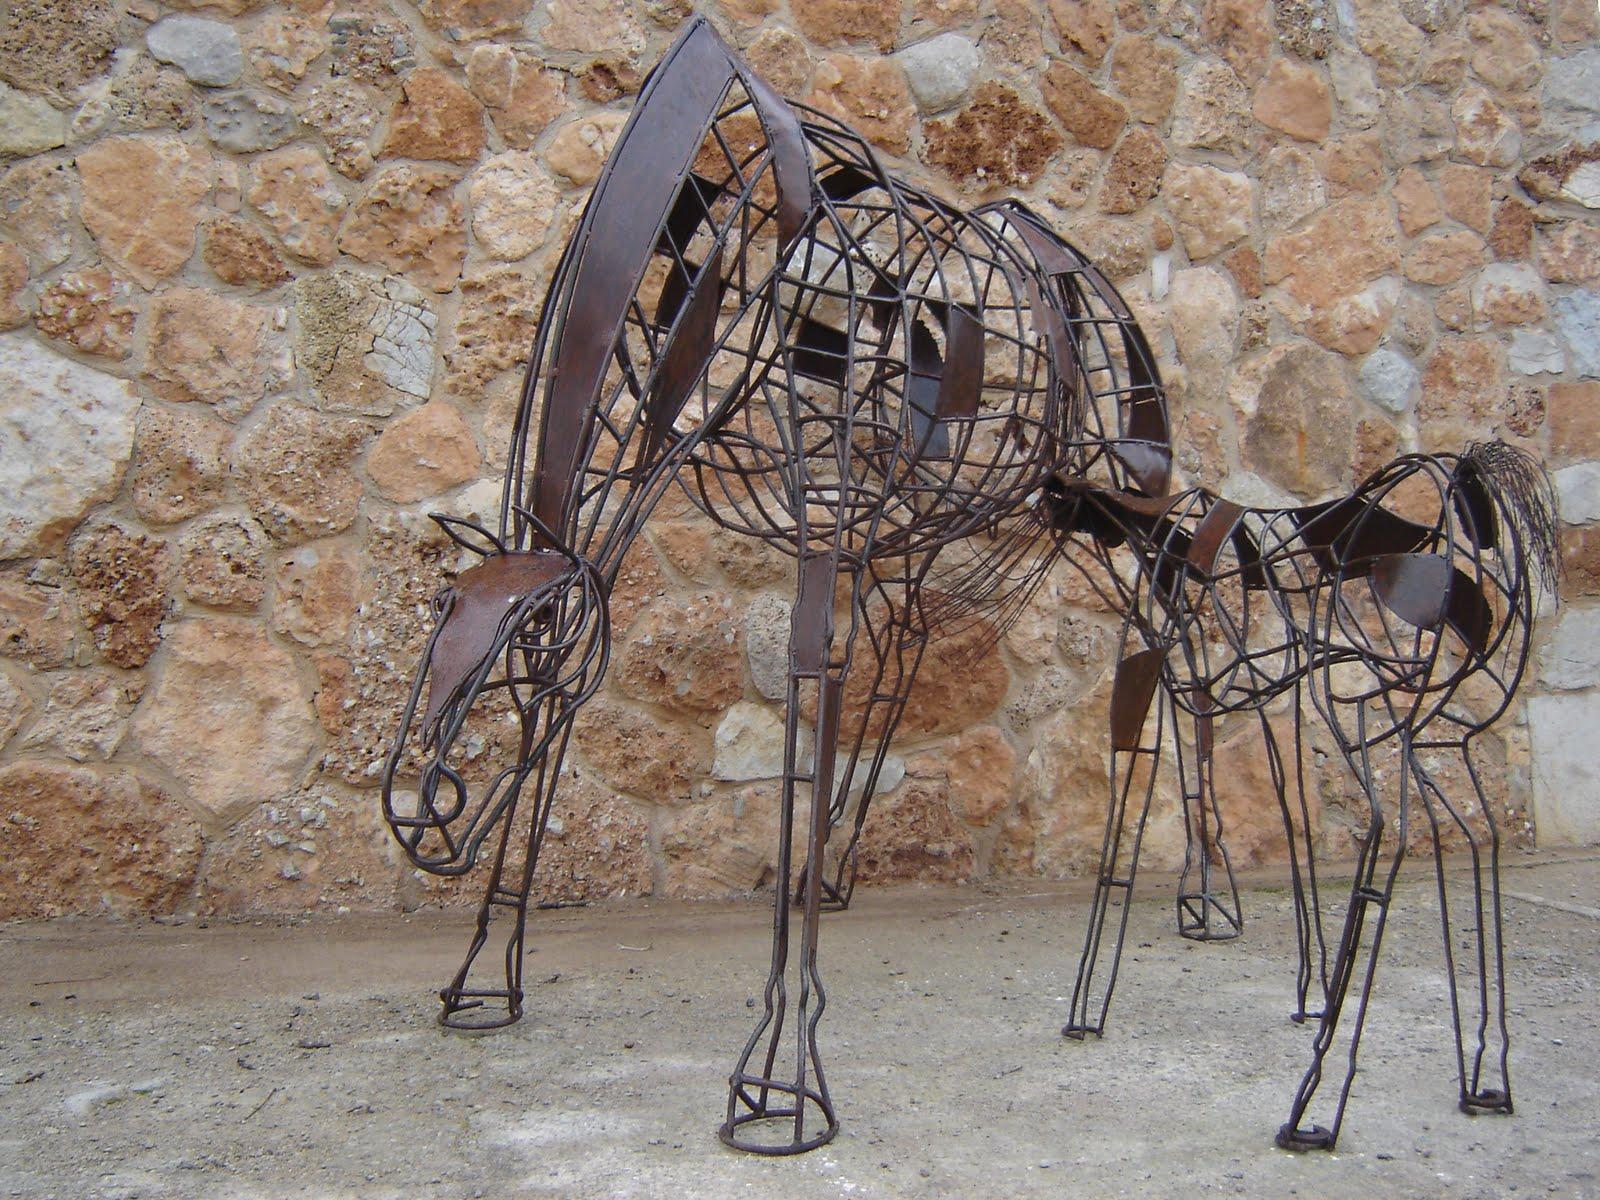 Binisalem Spain  City pictures : Arte en Hierro Juan Jose Oliva Cerezo: Maternidad escultura